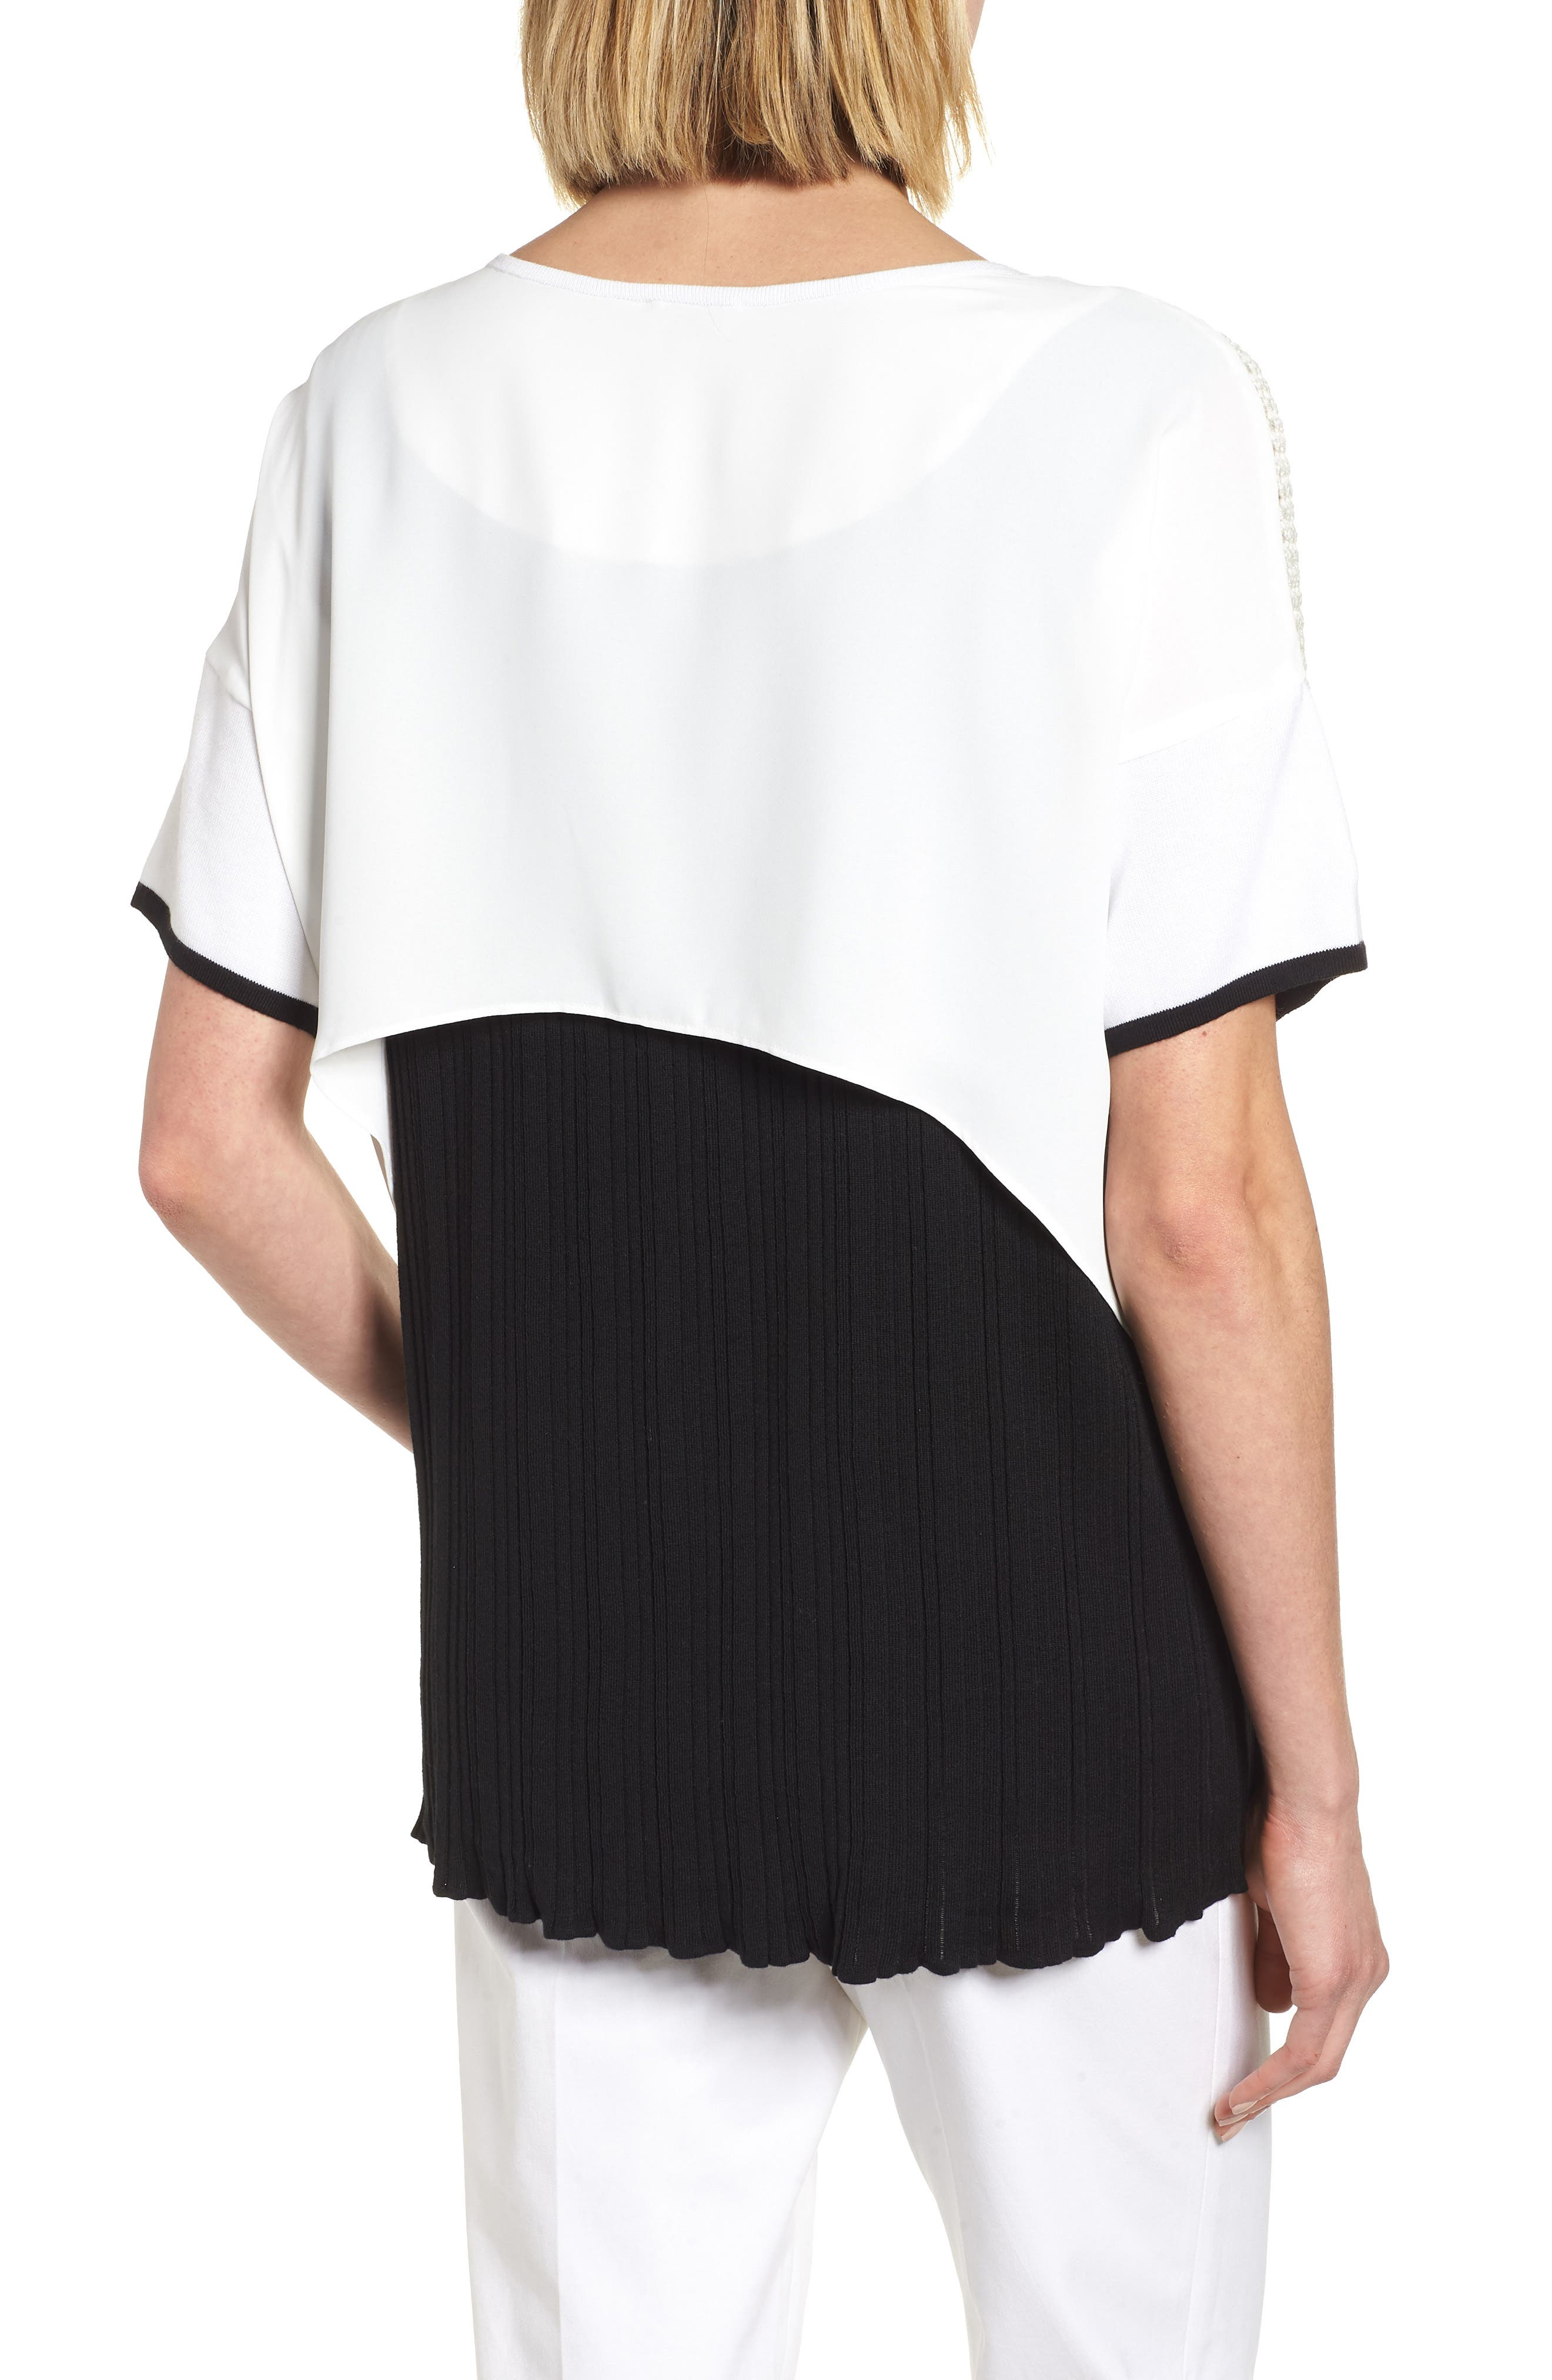 Mixed Media Short Sleeve Tunic Top,                             Alternate thumbnail 2, color,                             White/ Black